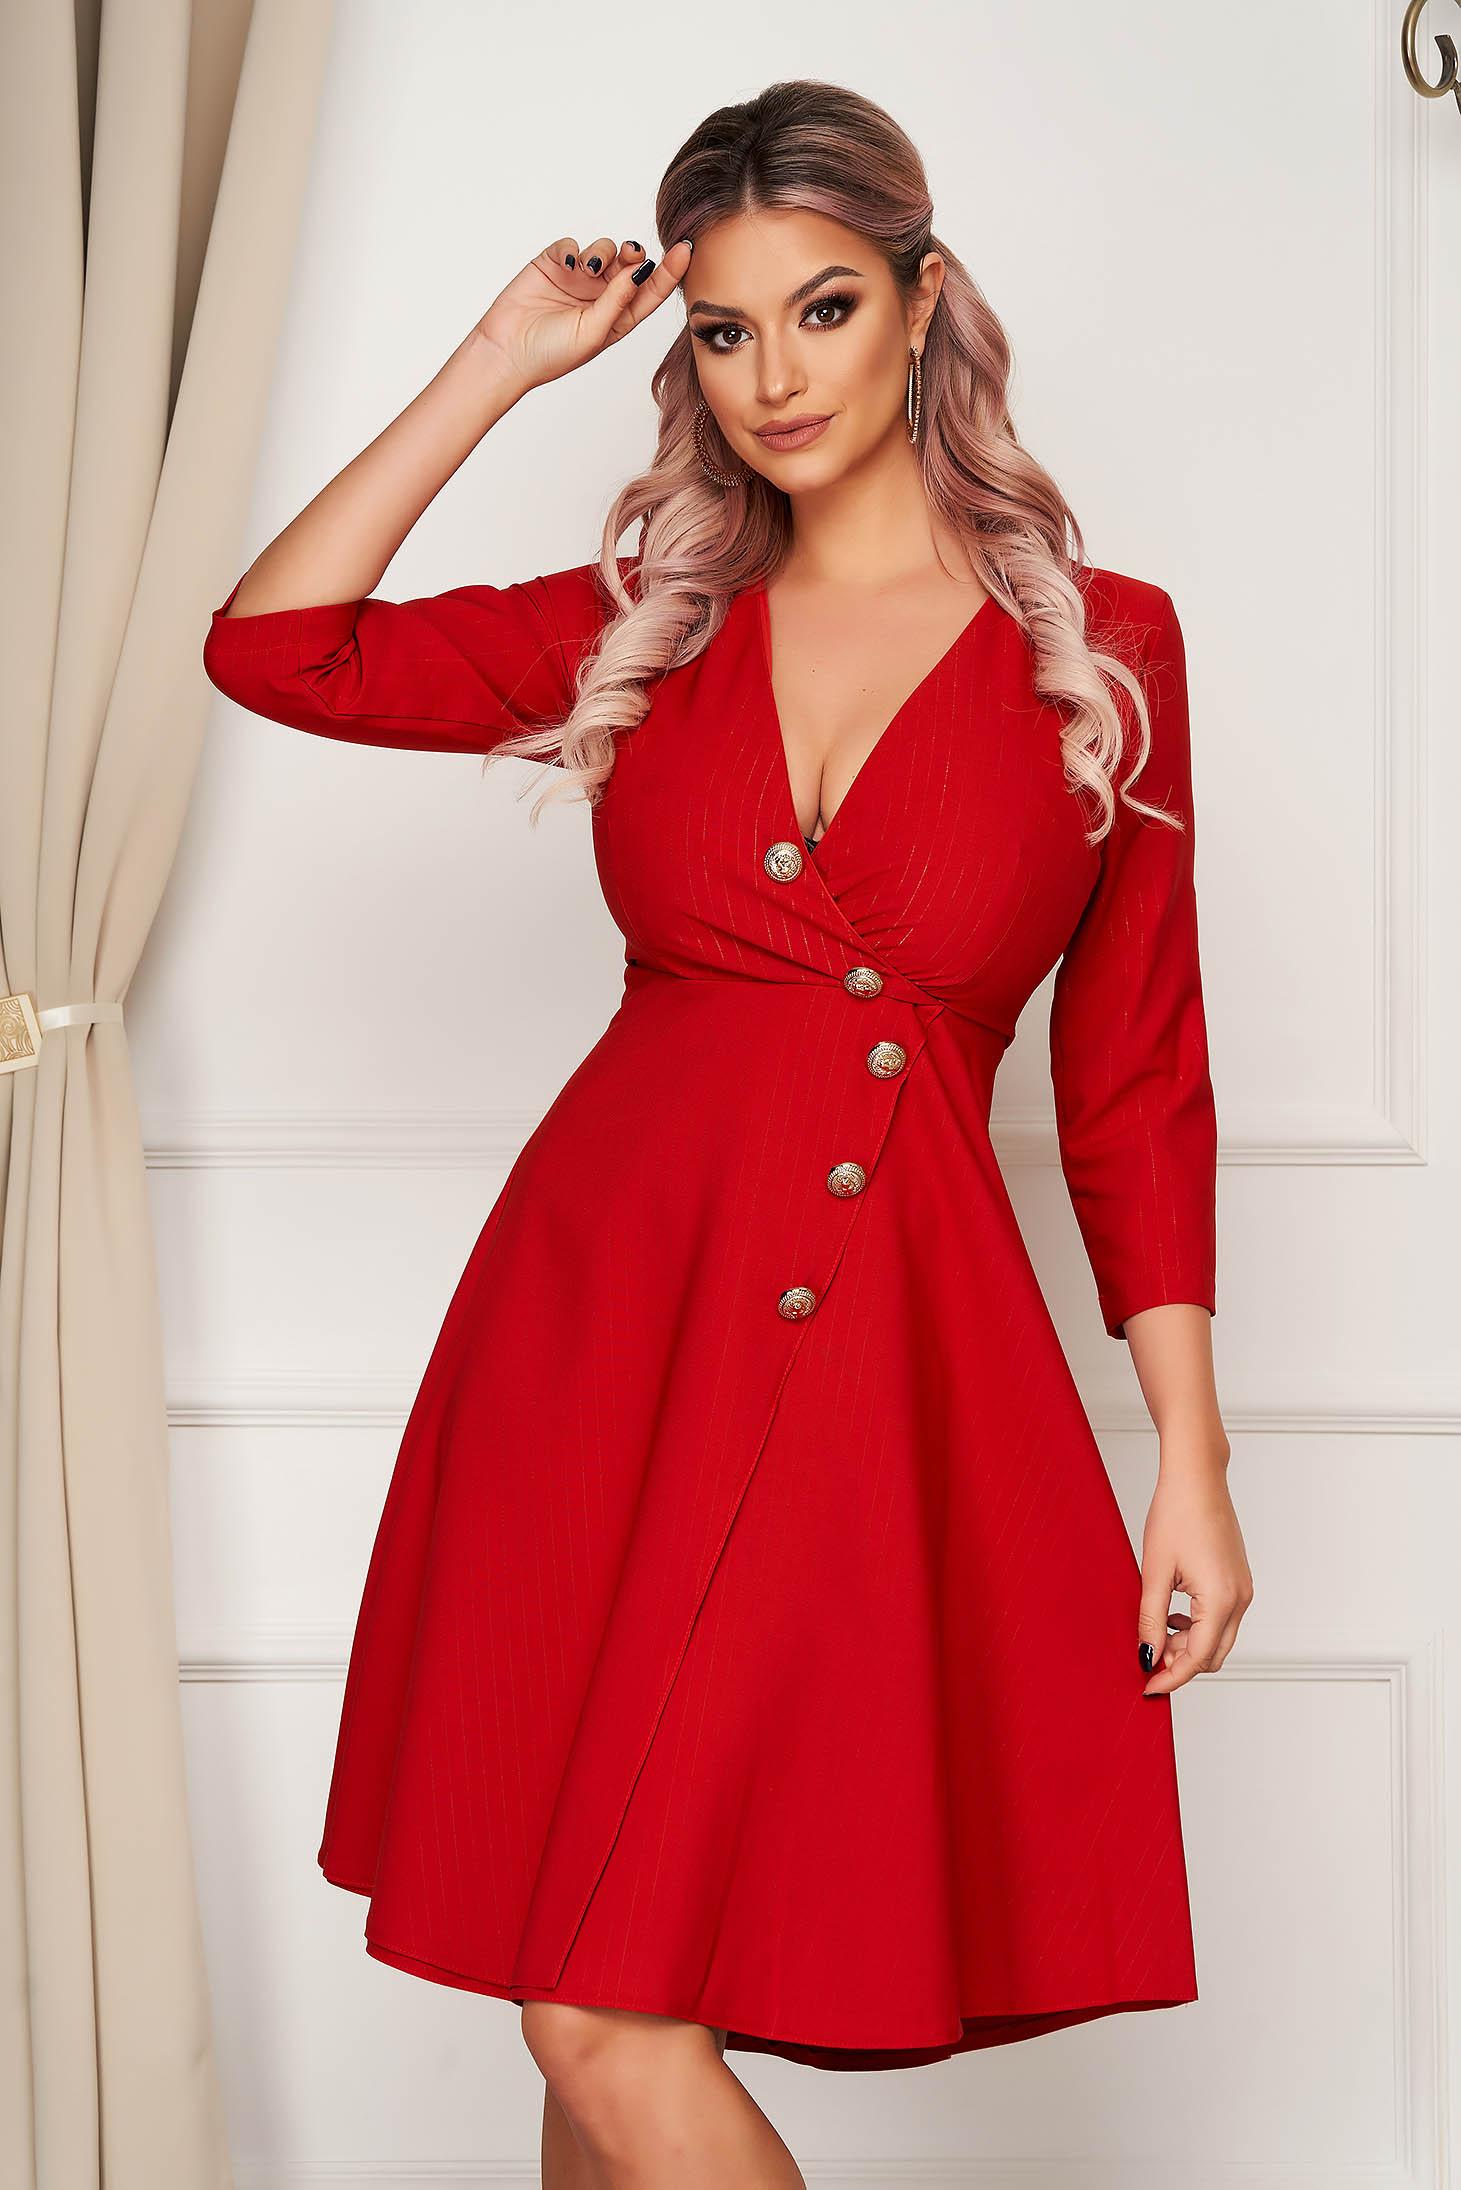 Rochie rosie eleganta midi in clos din stofa usor elastica accesorizata cu nasturi